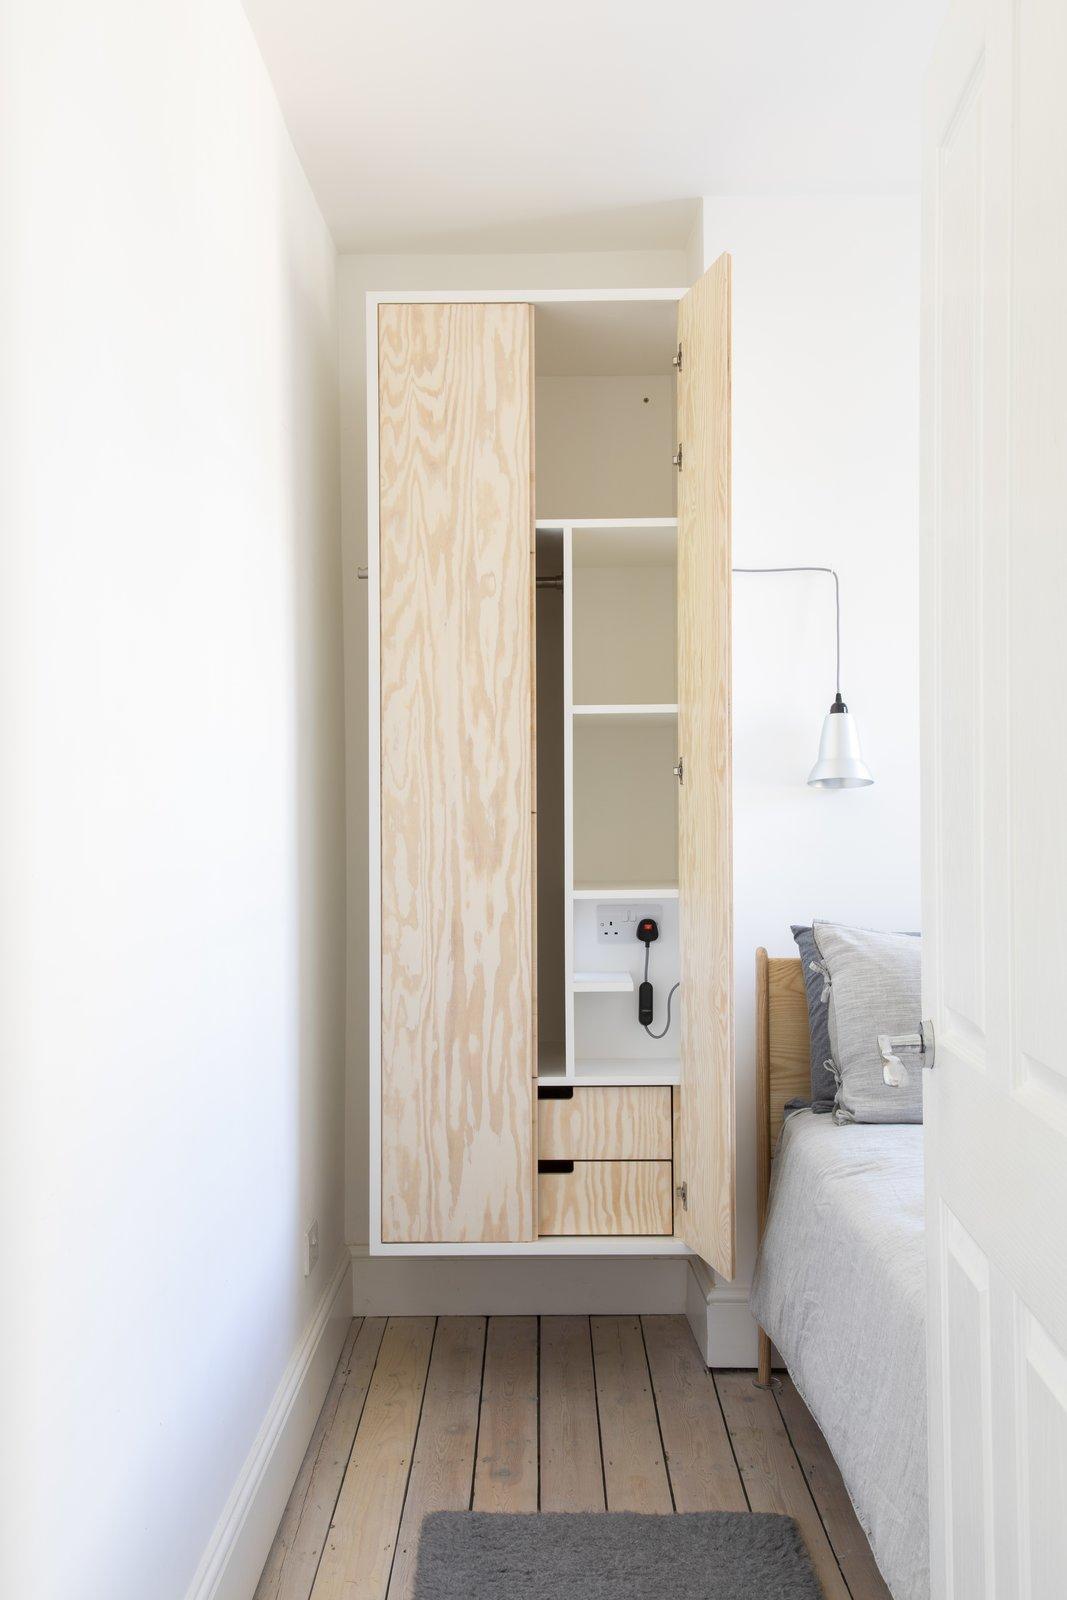 Elephant & Castle Maisonette Refurbishement by Atelier Baulier Bedroom Storage